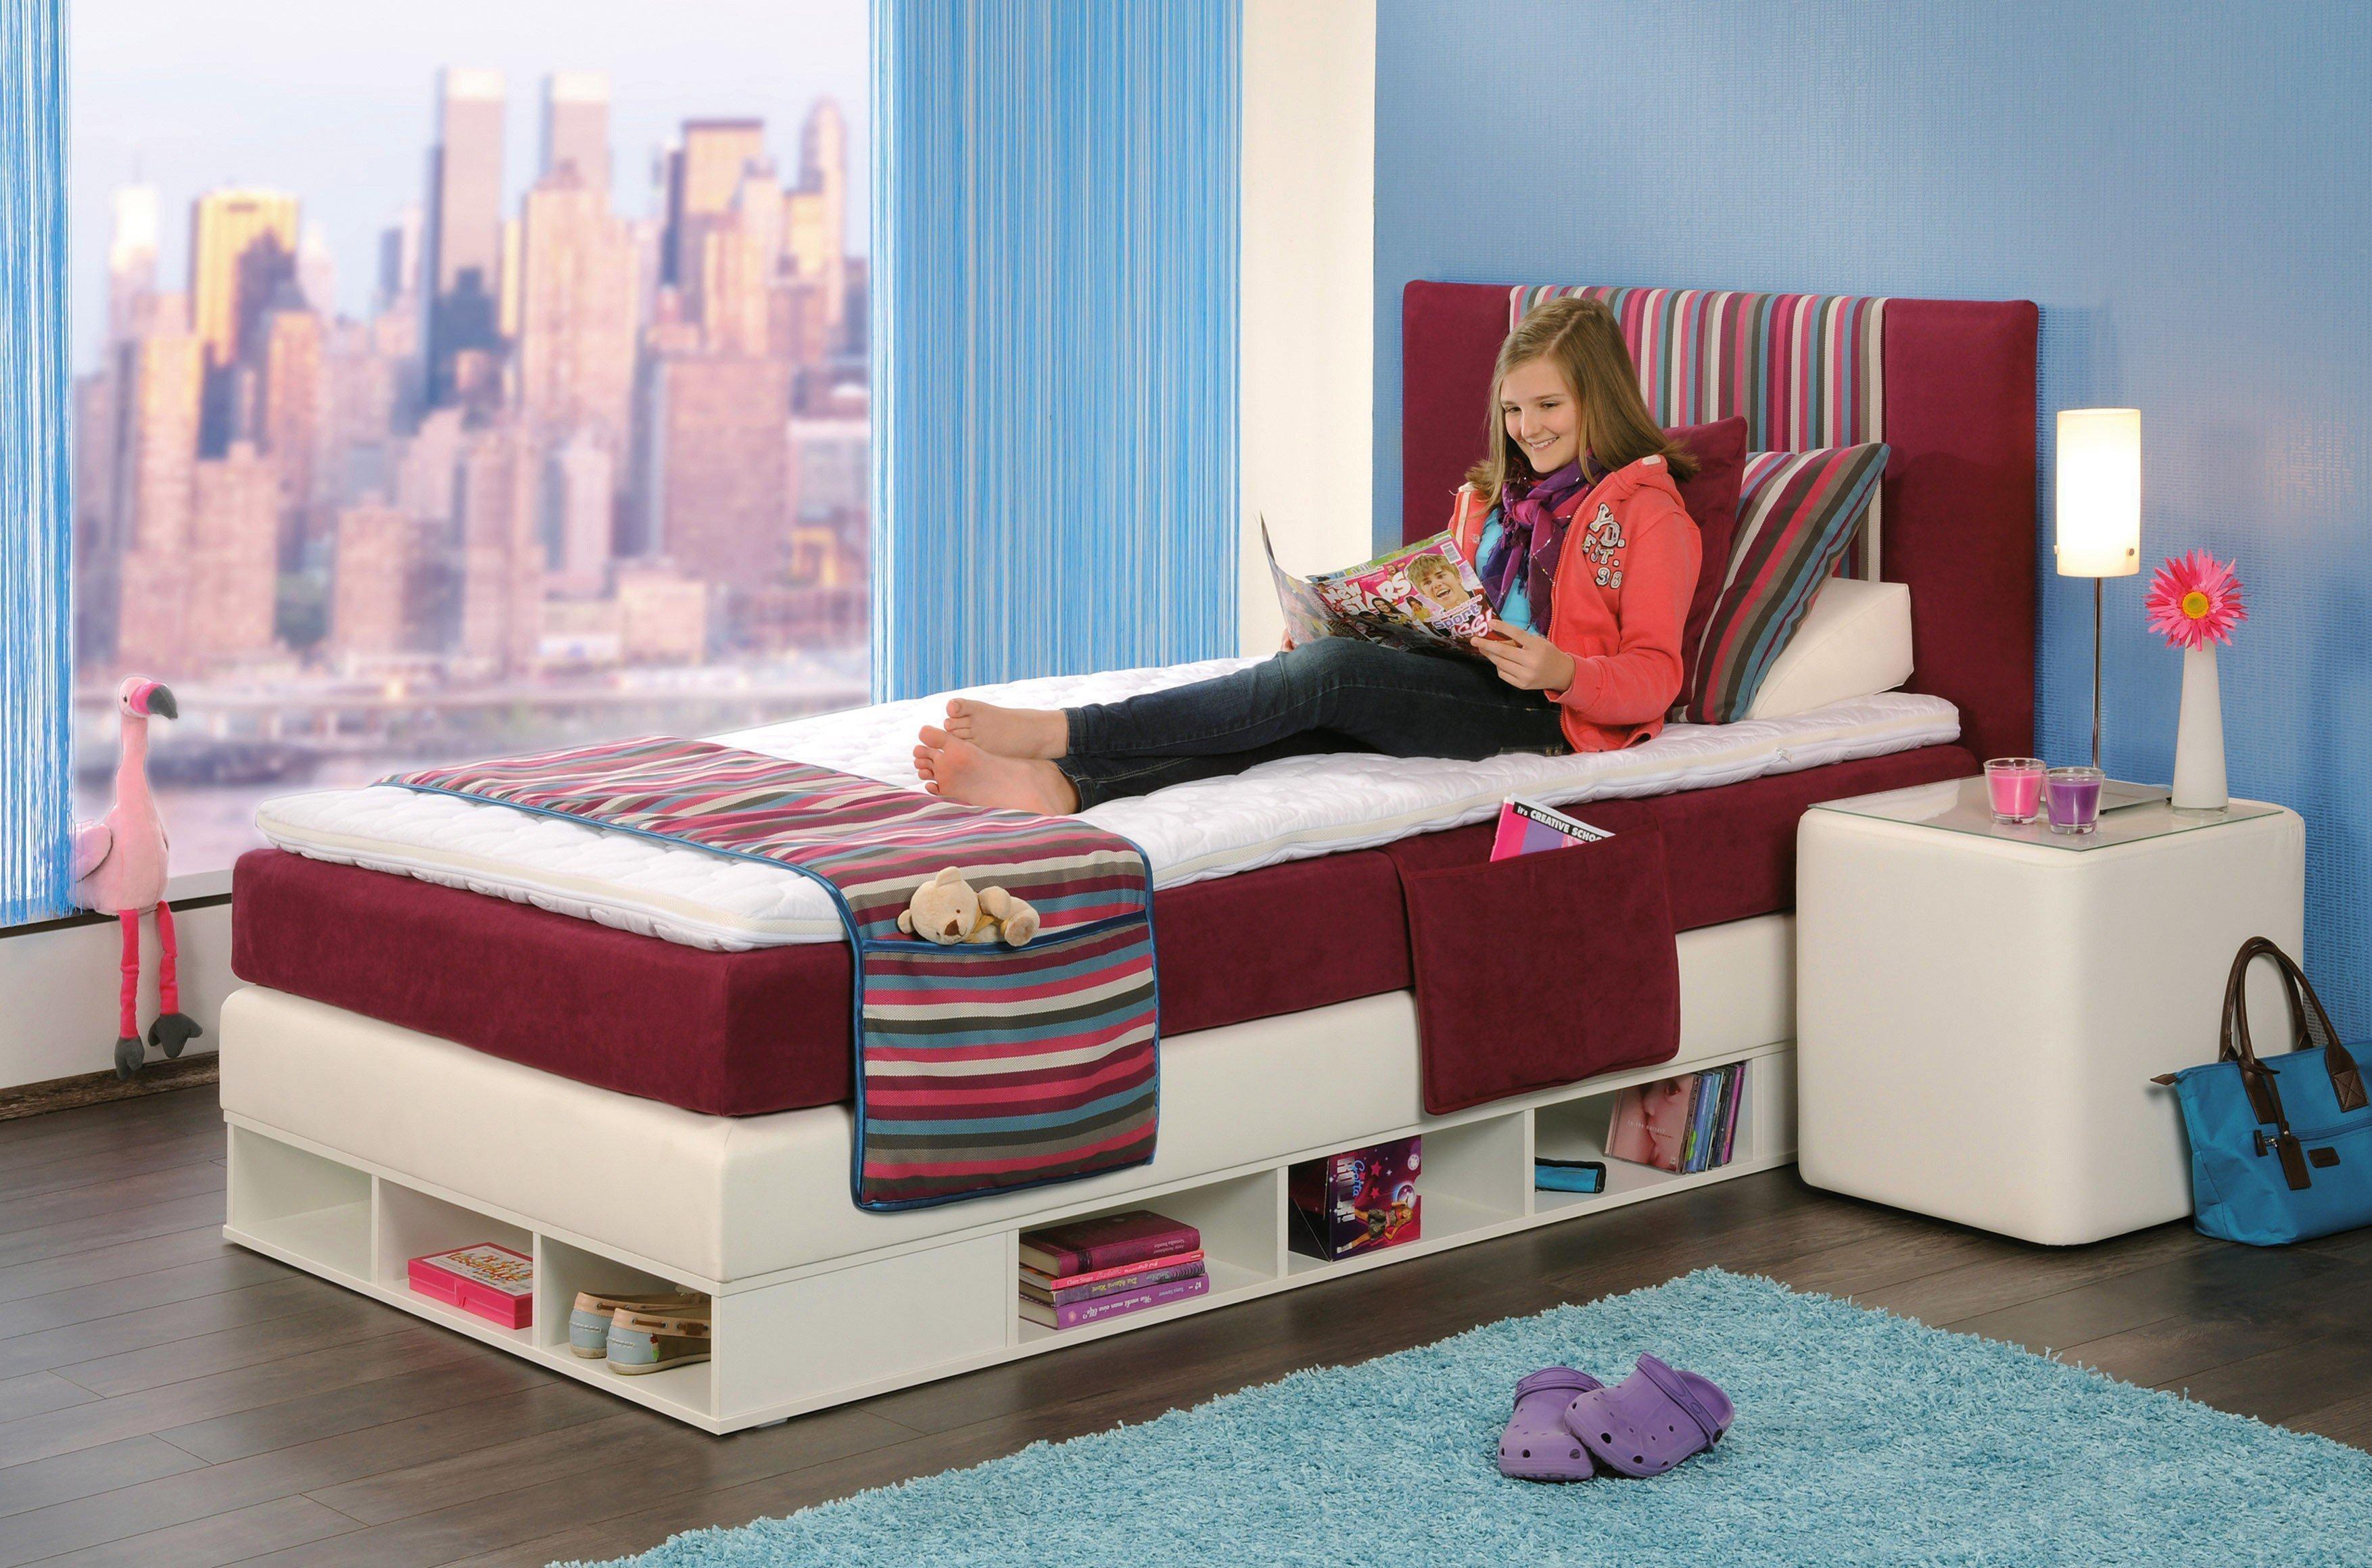 boxspringbett youngster von oschmann in purpur wei. Black Bedroom Furniture Sets. Home Design Ideas